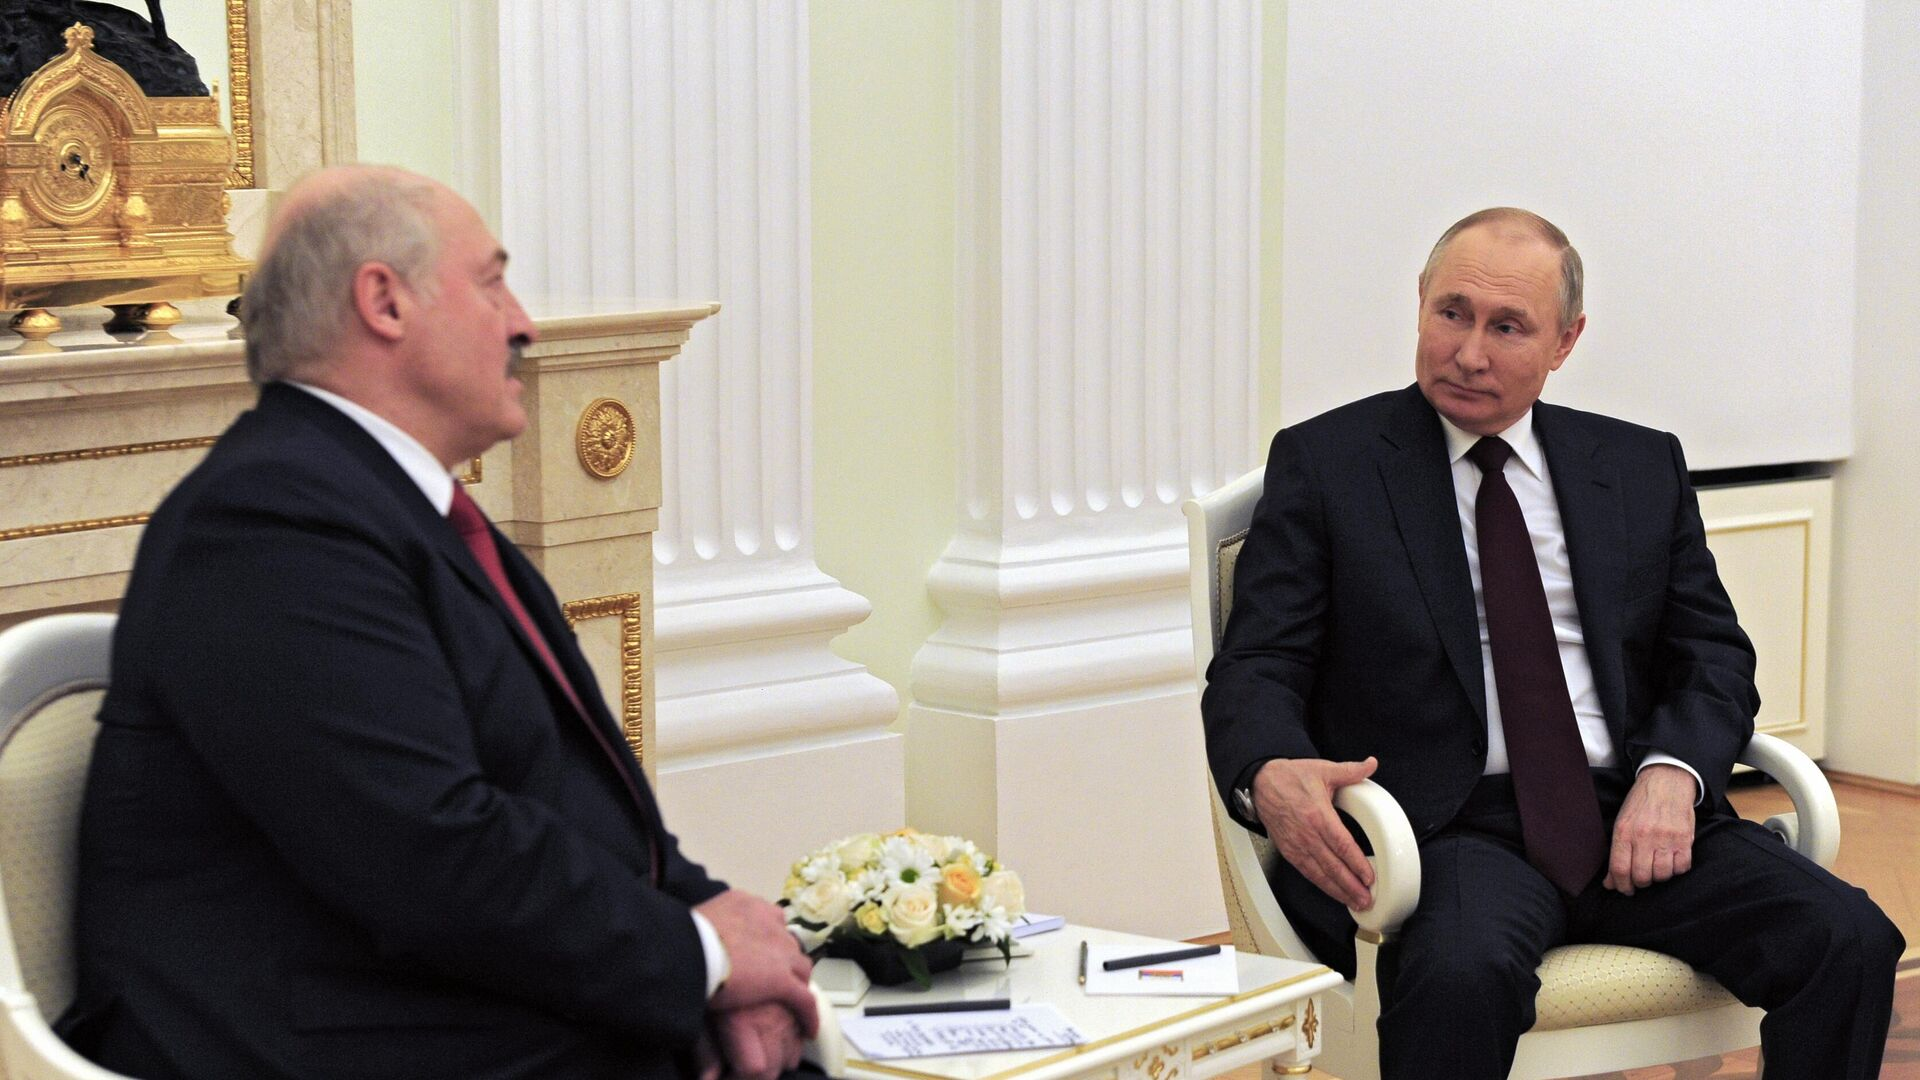 Президент РФ Владимир Путин и президент Белоруссии Александр Лукашенко во время встречи - РИА Новости, 1920, 22.04.2021